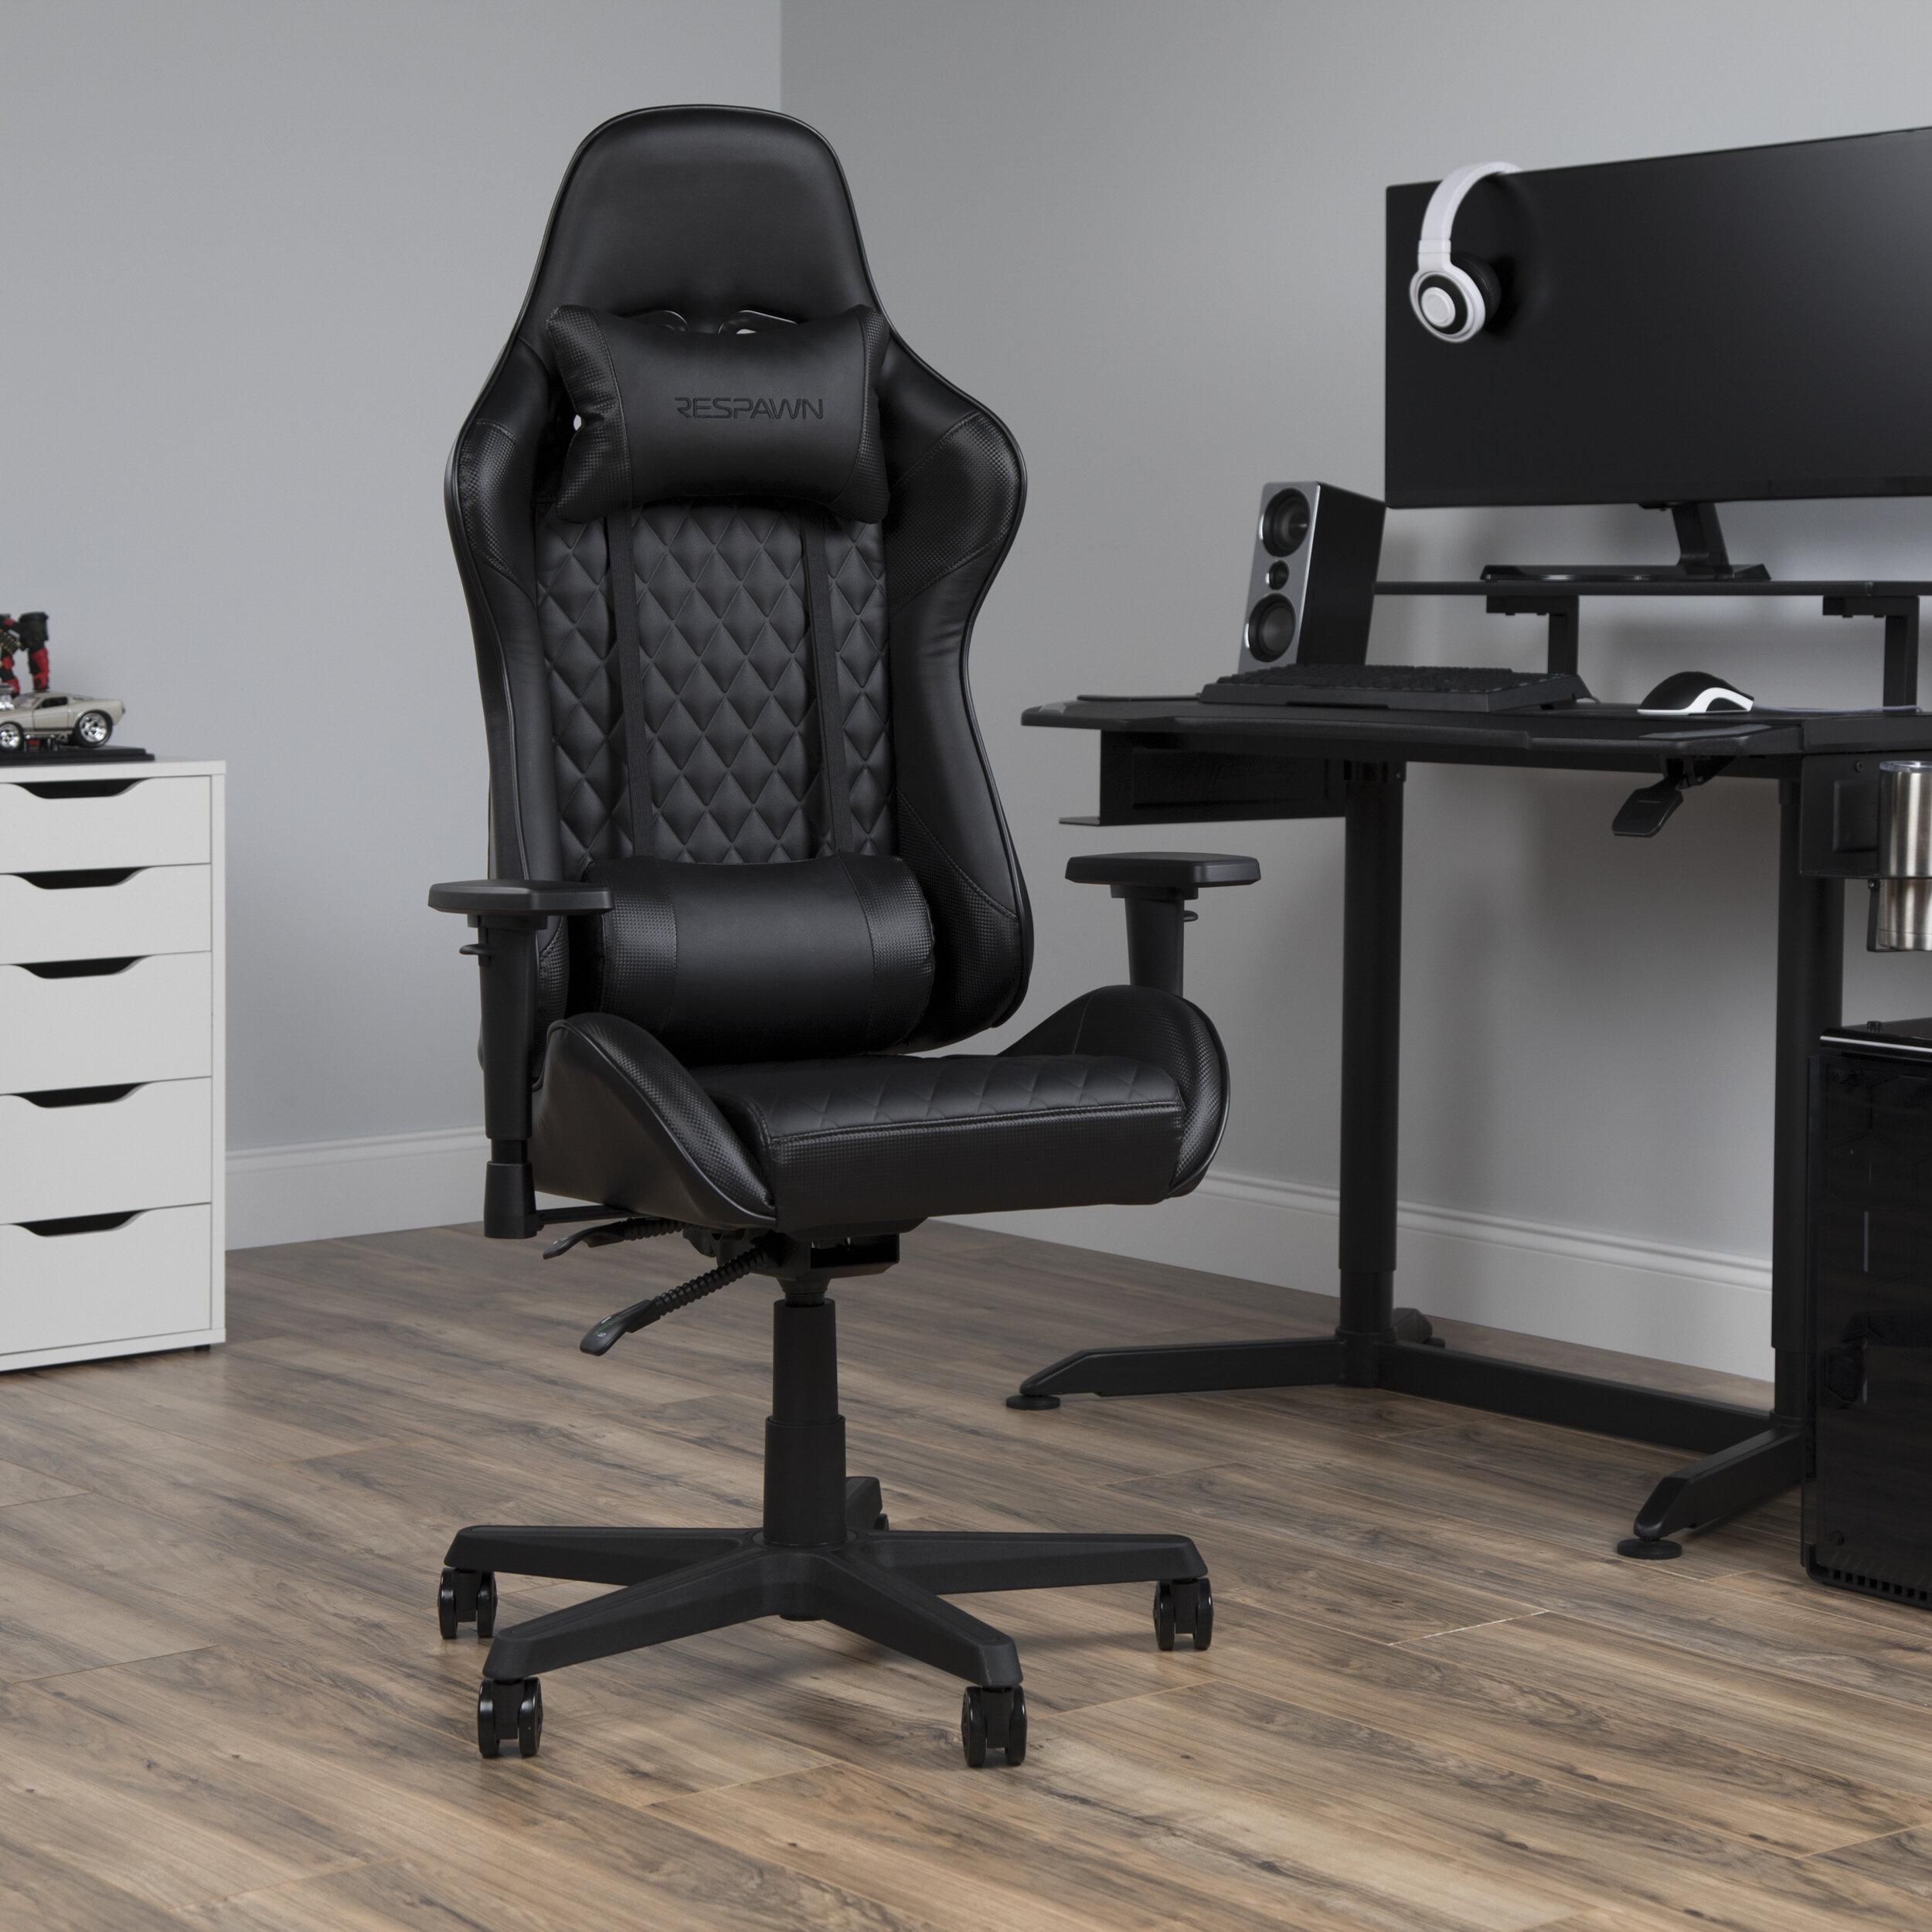 Respawn 100 Pc Racing Gaming Chair Reviews Wayfair